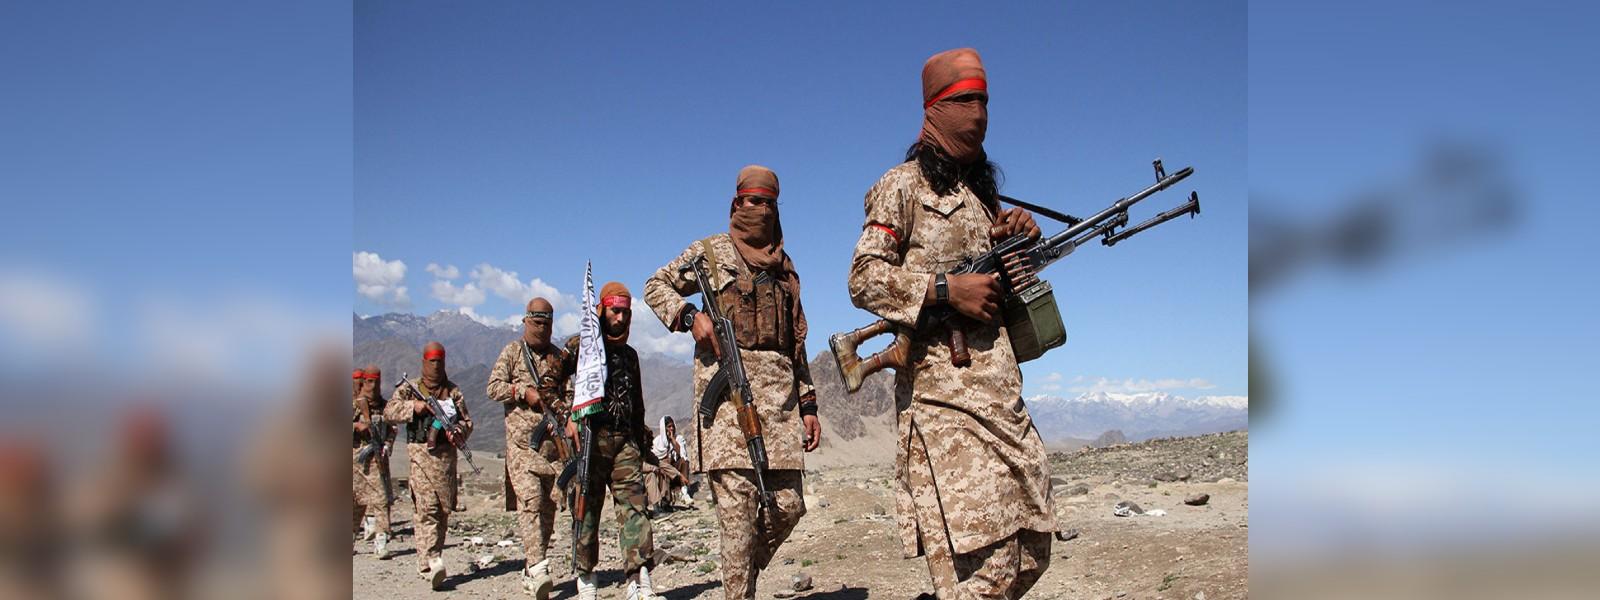 Mullah Baradar to lead new Taliban Government